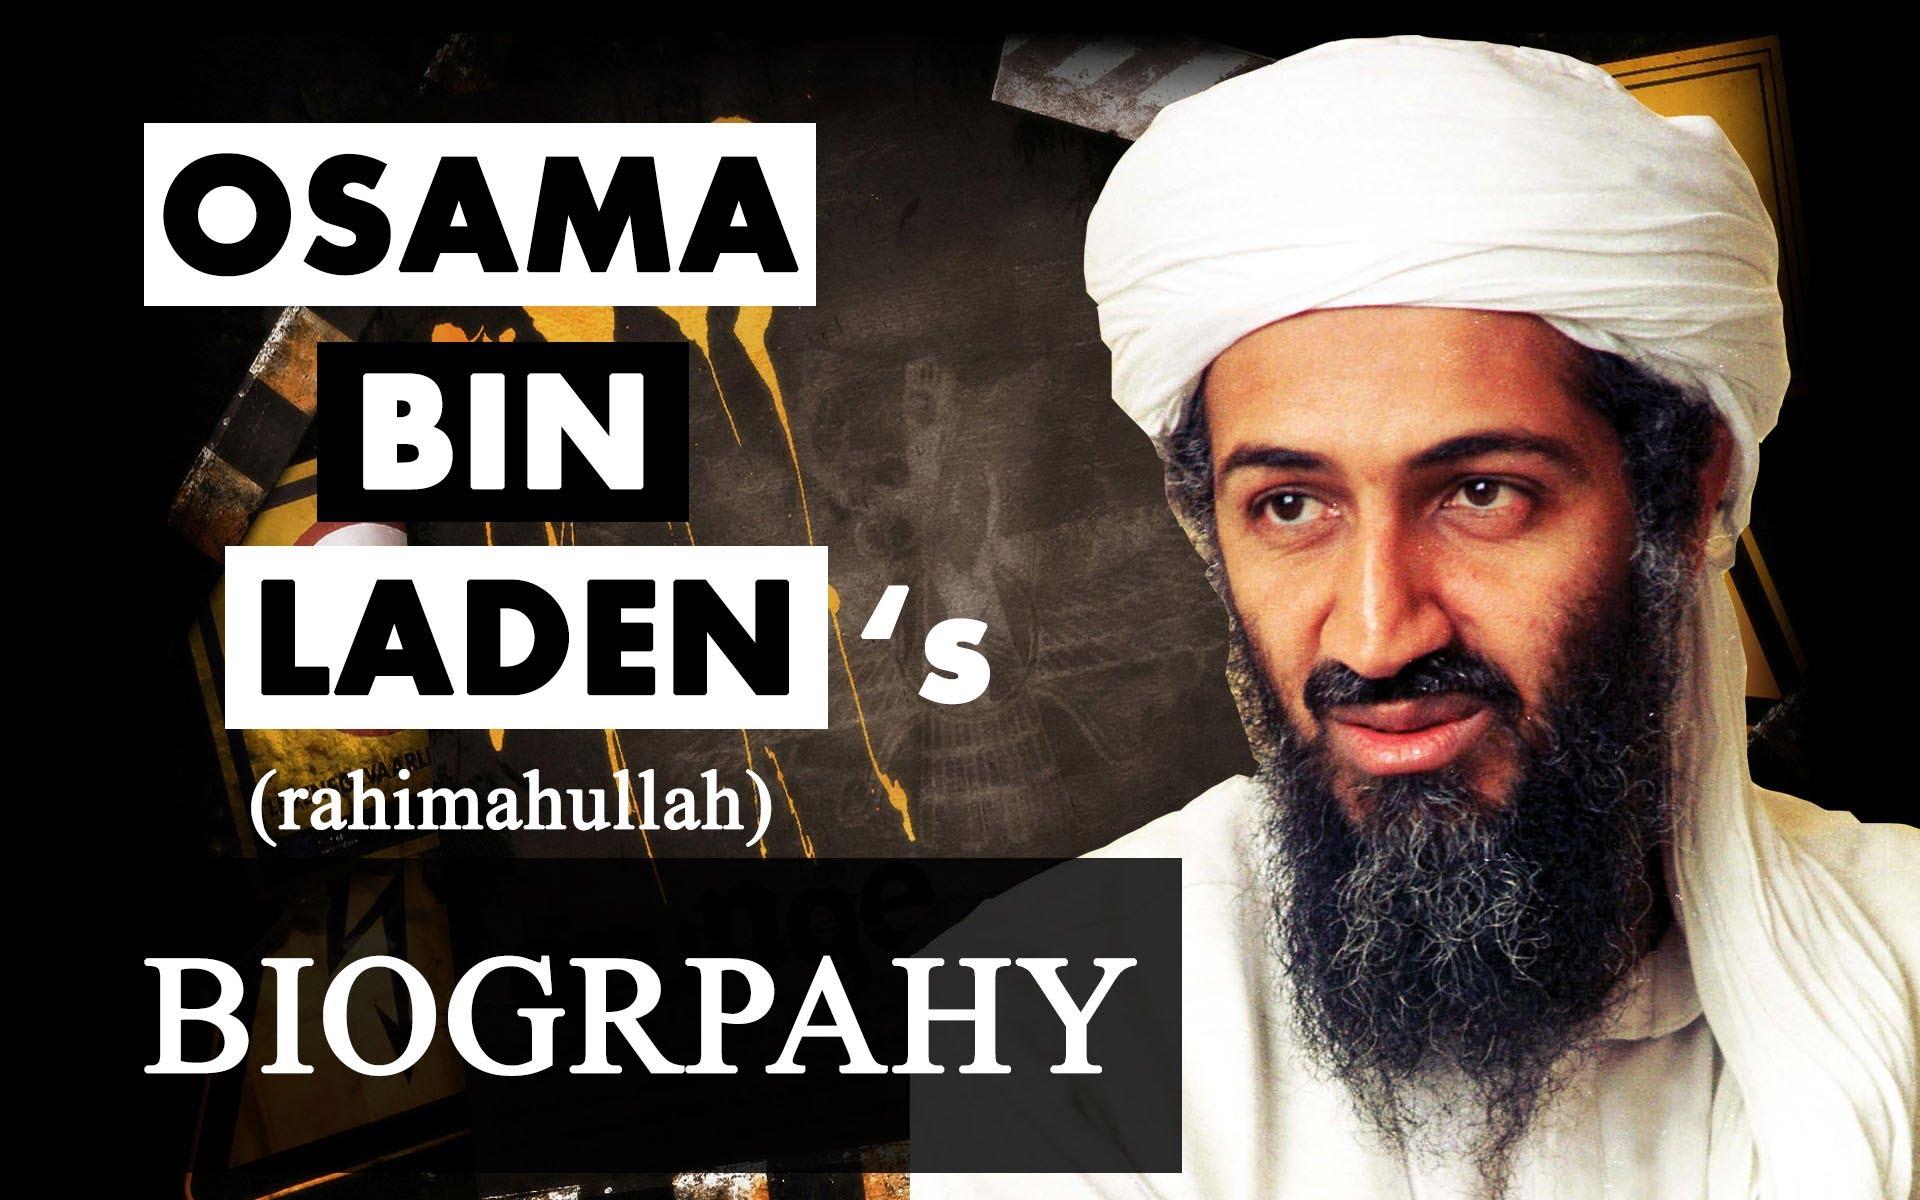 Osama bin Laden Biography Documentary | Who Is Sheikh Osama bin Laden - Reviver of Jihad?